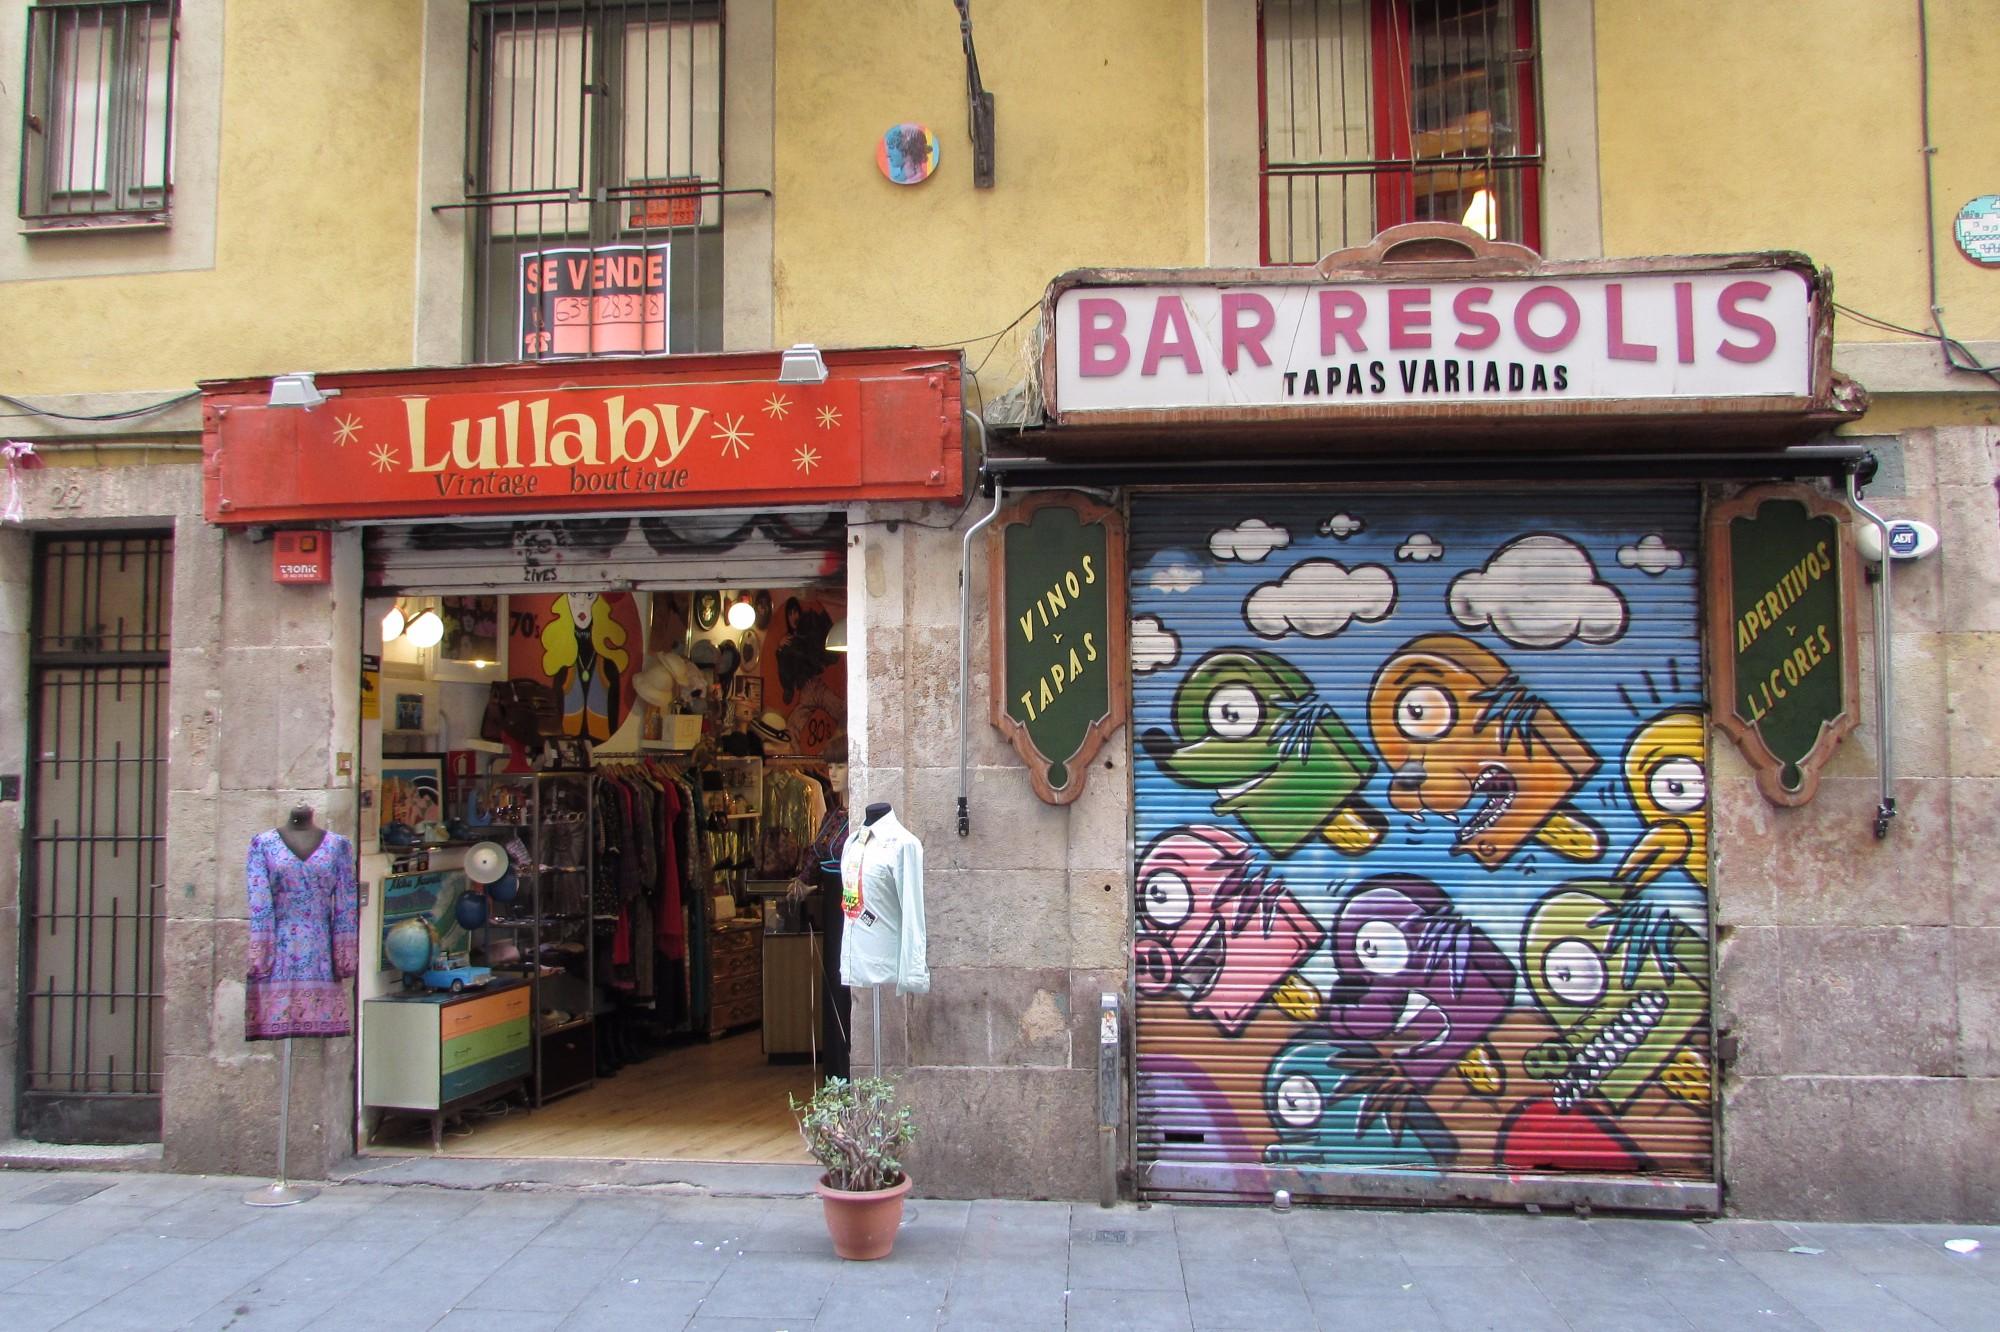 fbbfdcc4168 Best Vintage Shops + Independent Fashion Boutiques in Barcelona (For Men +  Women)